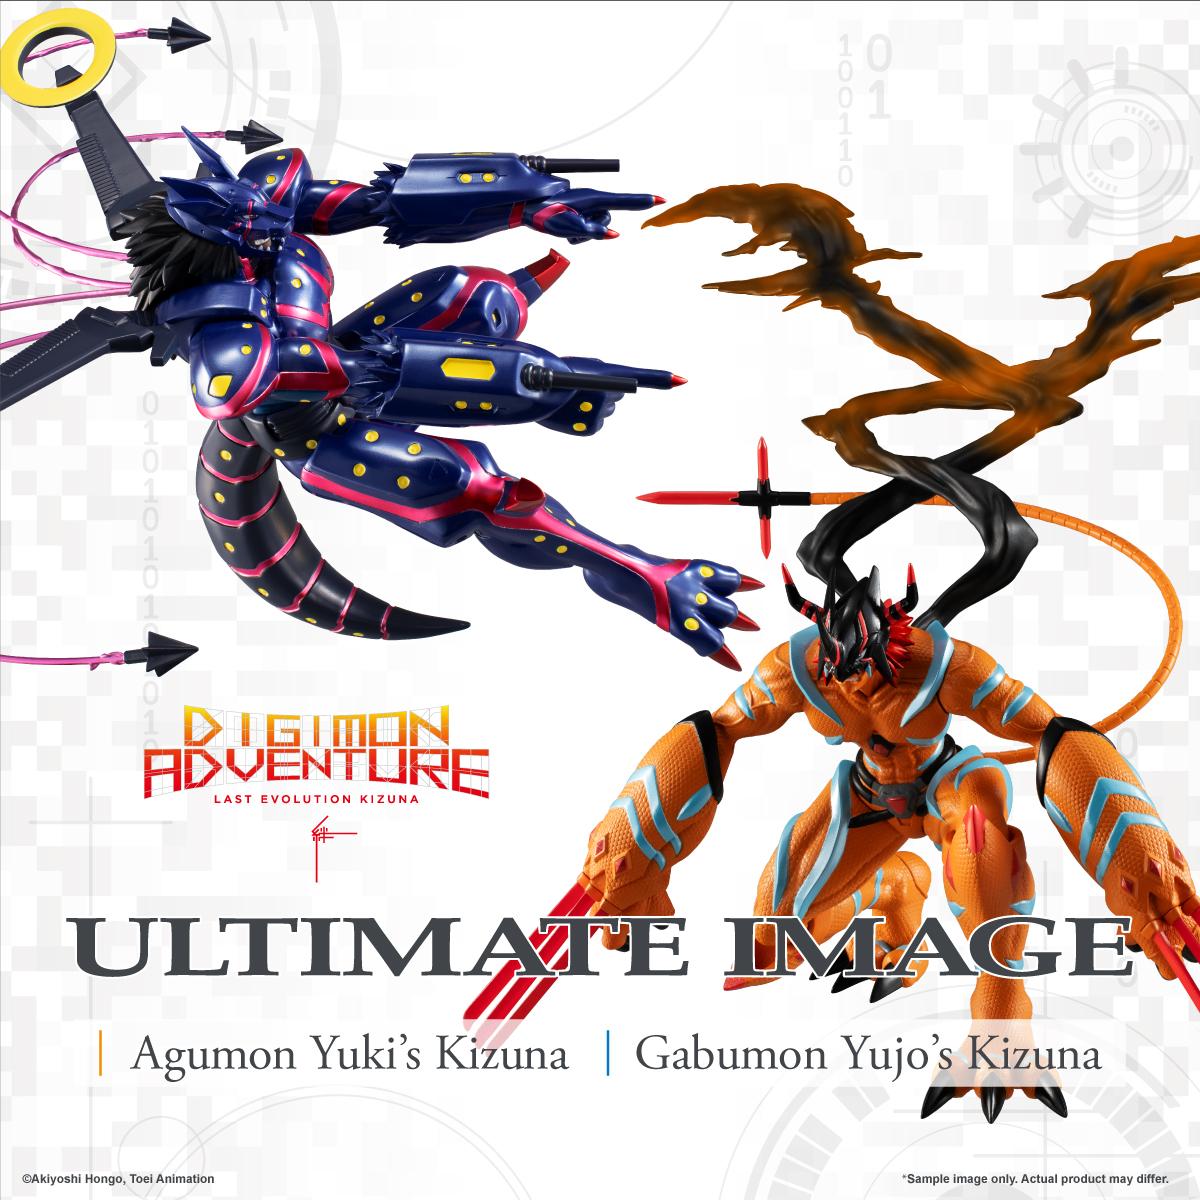 Agumon -Yuki's Kizuna & Gabumon - Yujo's Kizuna – which appeared in the unforgettable scene of Digimon Adventure Last Evolution Kizuna, are now available in the ULTIMATE IMAGE series!  Pre-order yours today!  https://t.co/MAMMdmVnt2 https://t.co/UYeaWtiDKB